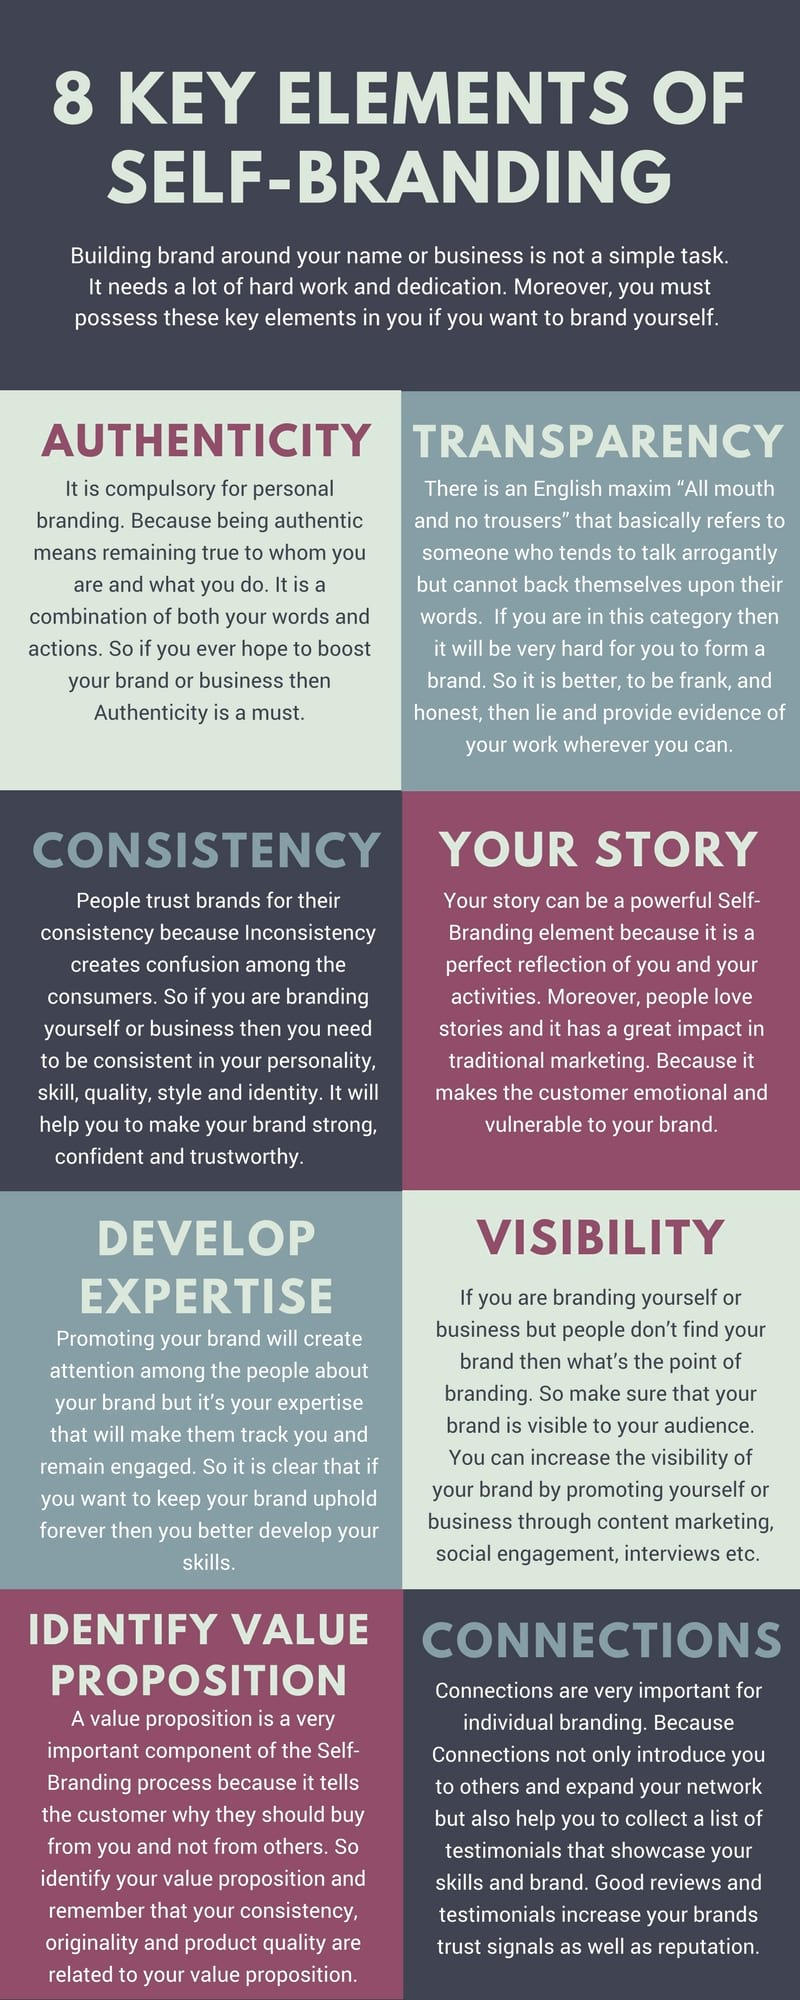 Key Elements of Self-Branding